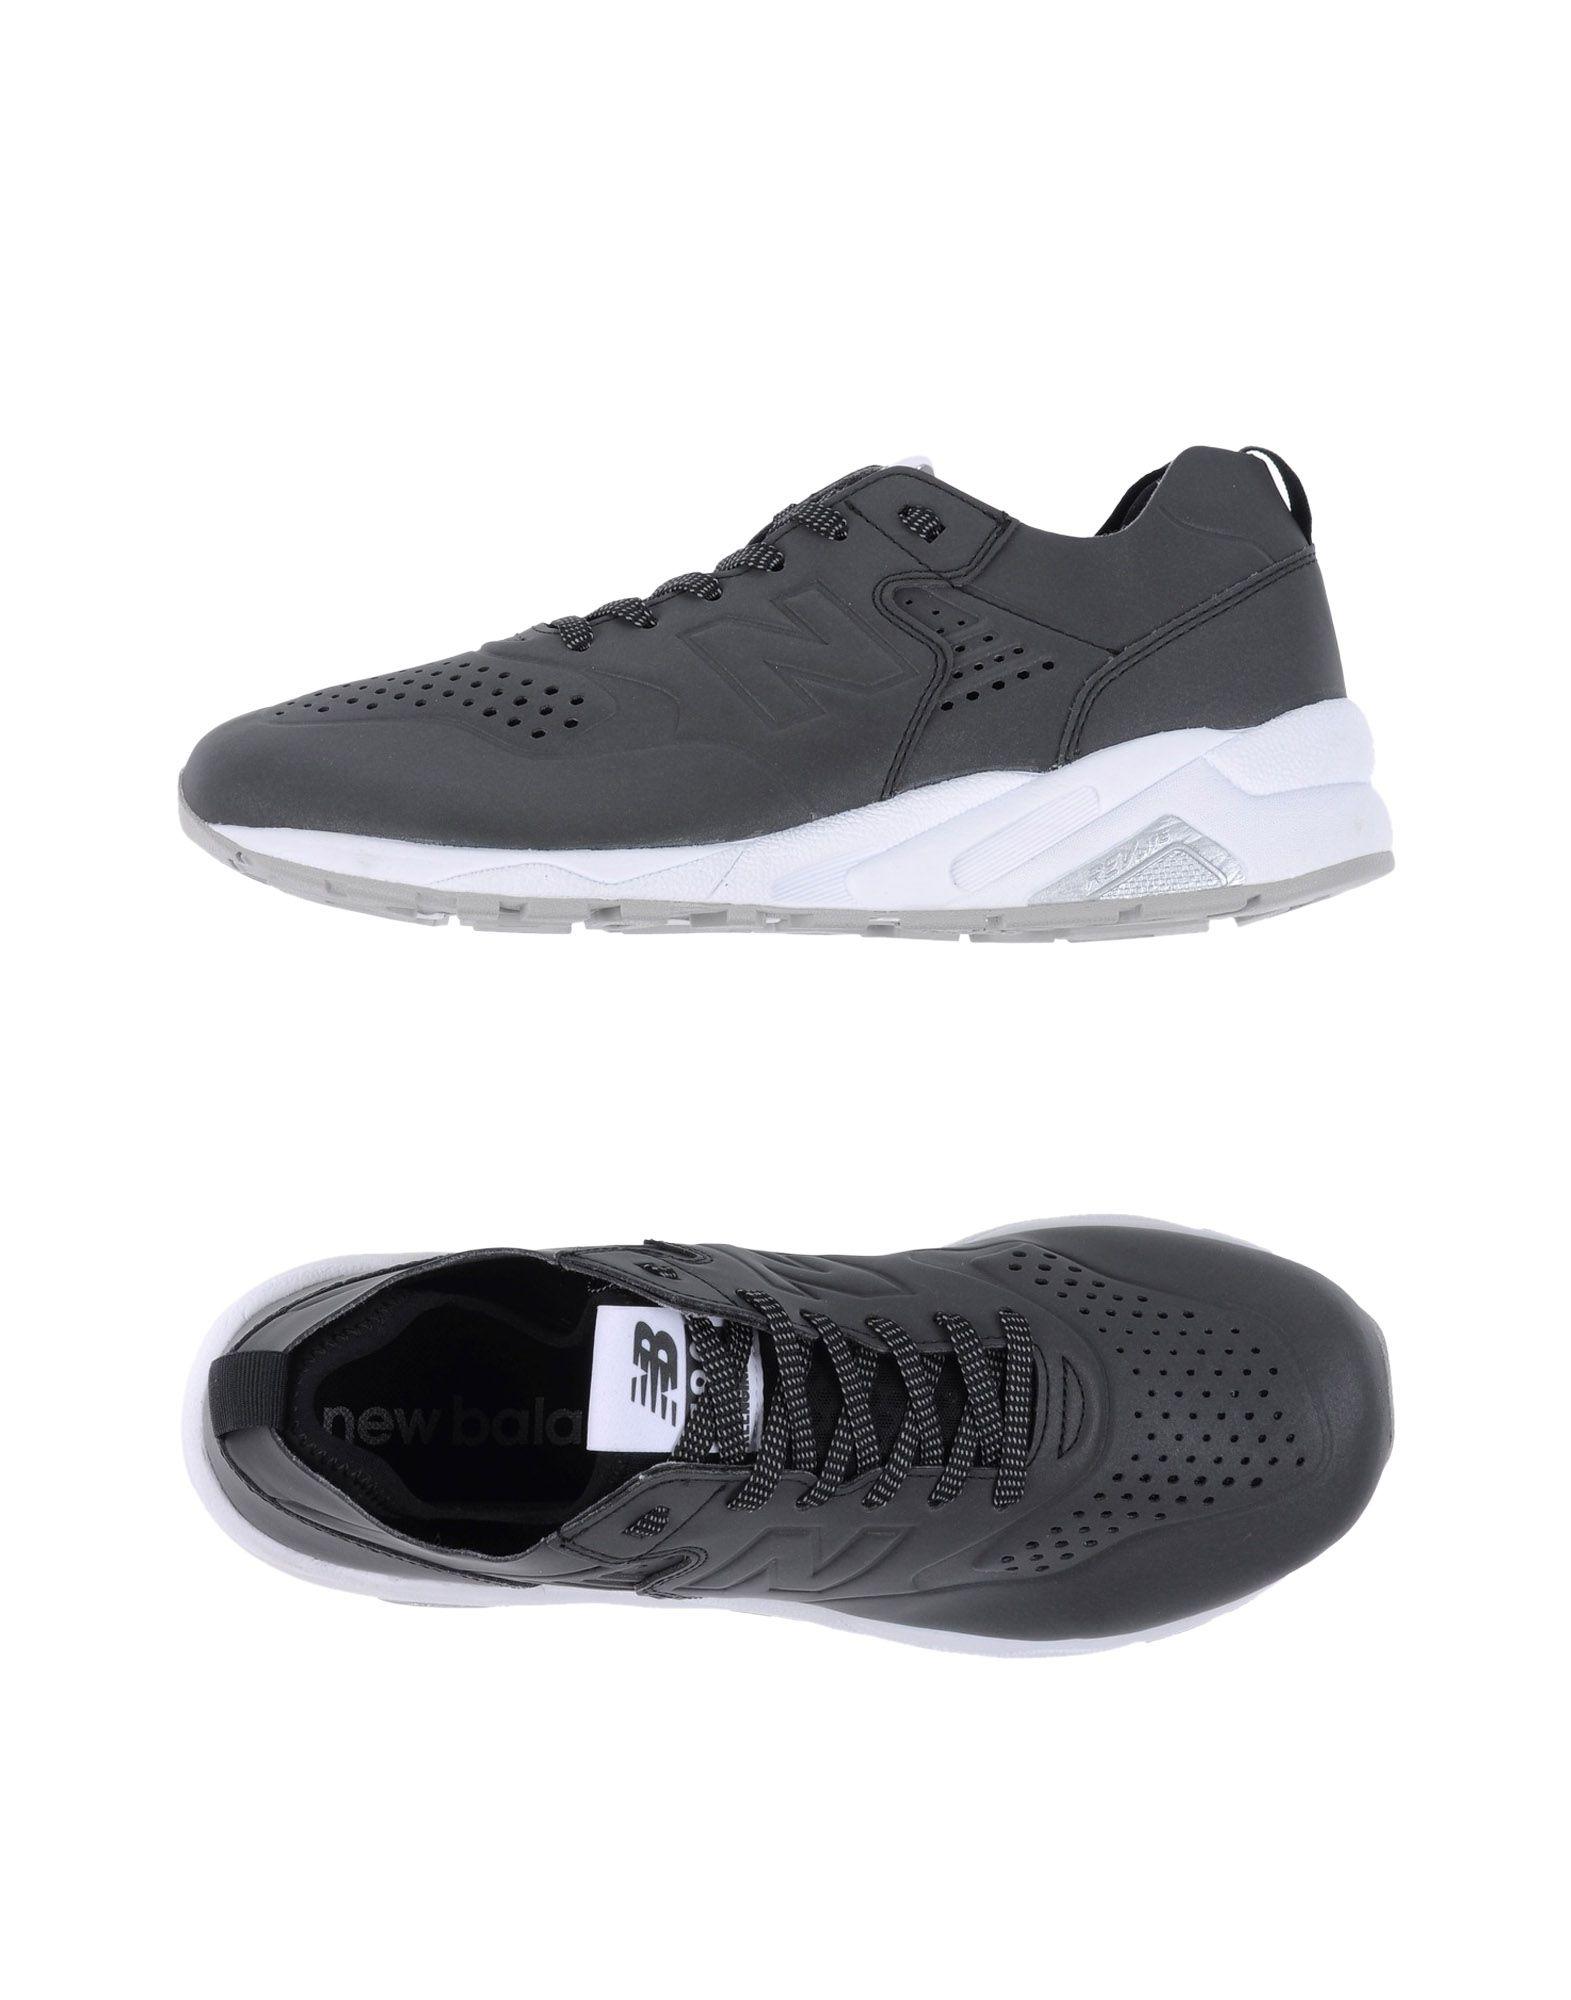 Rabatt echte Schuhe New Balance 580 Hybrid Seasonal Colors  11195893OR